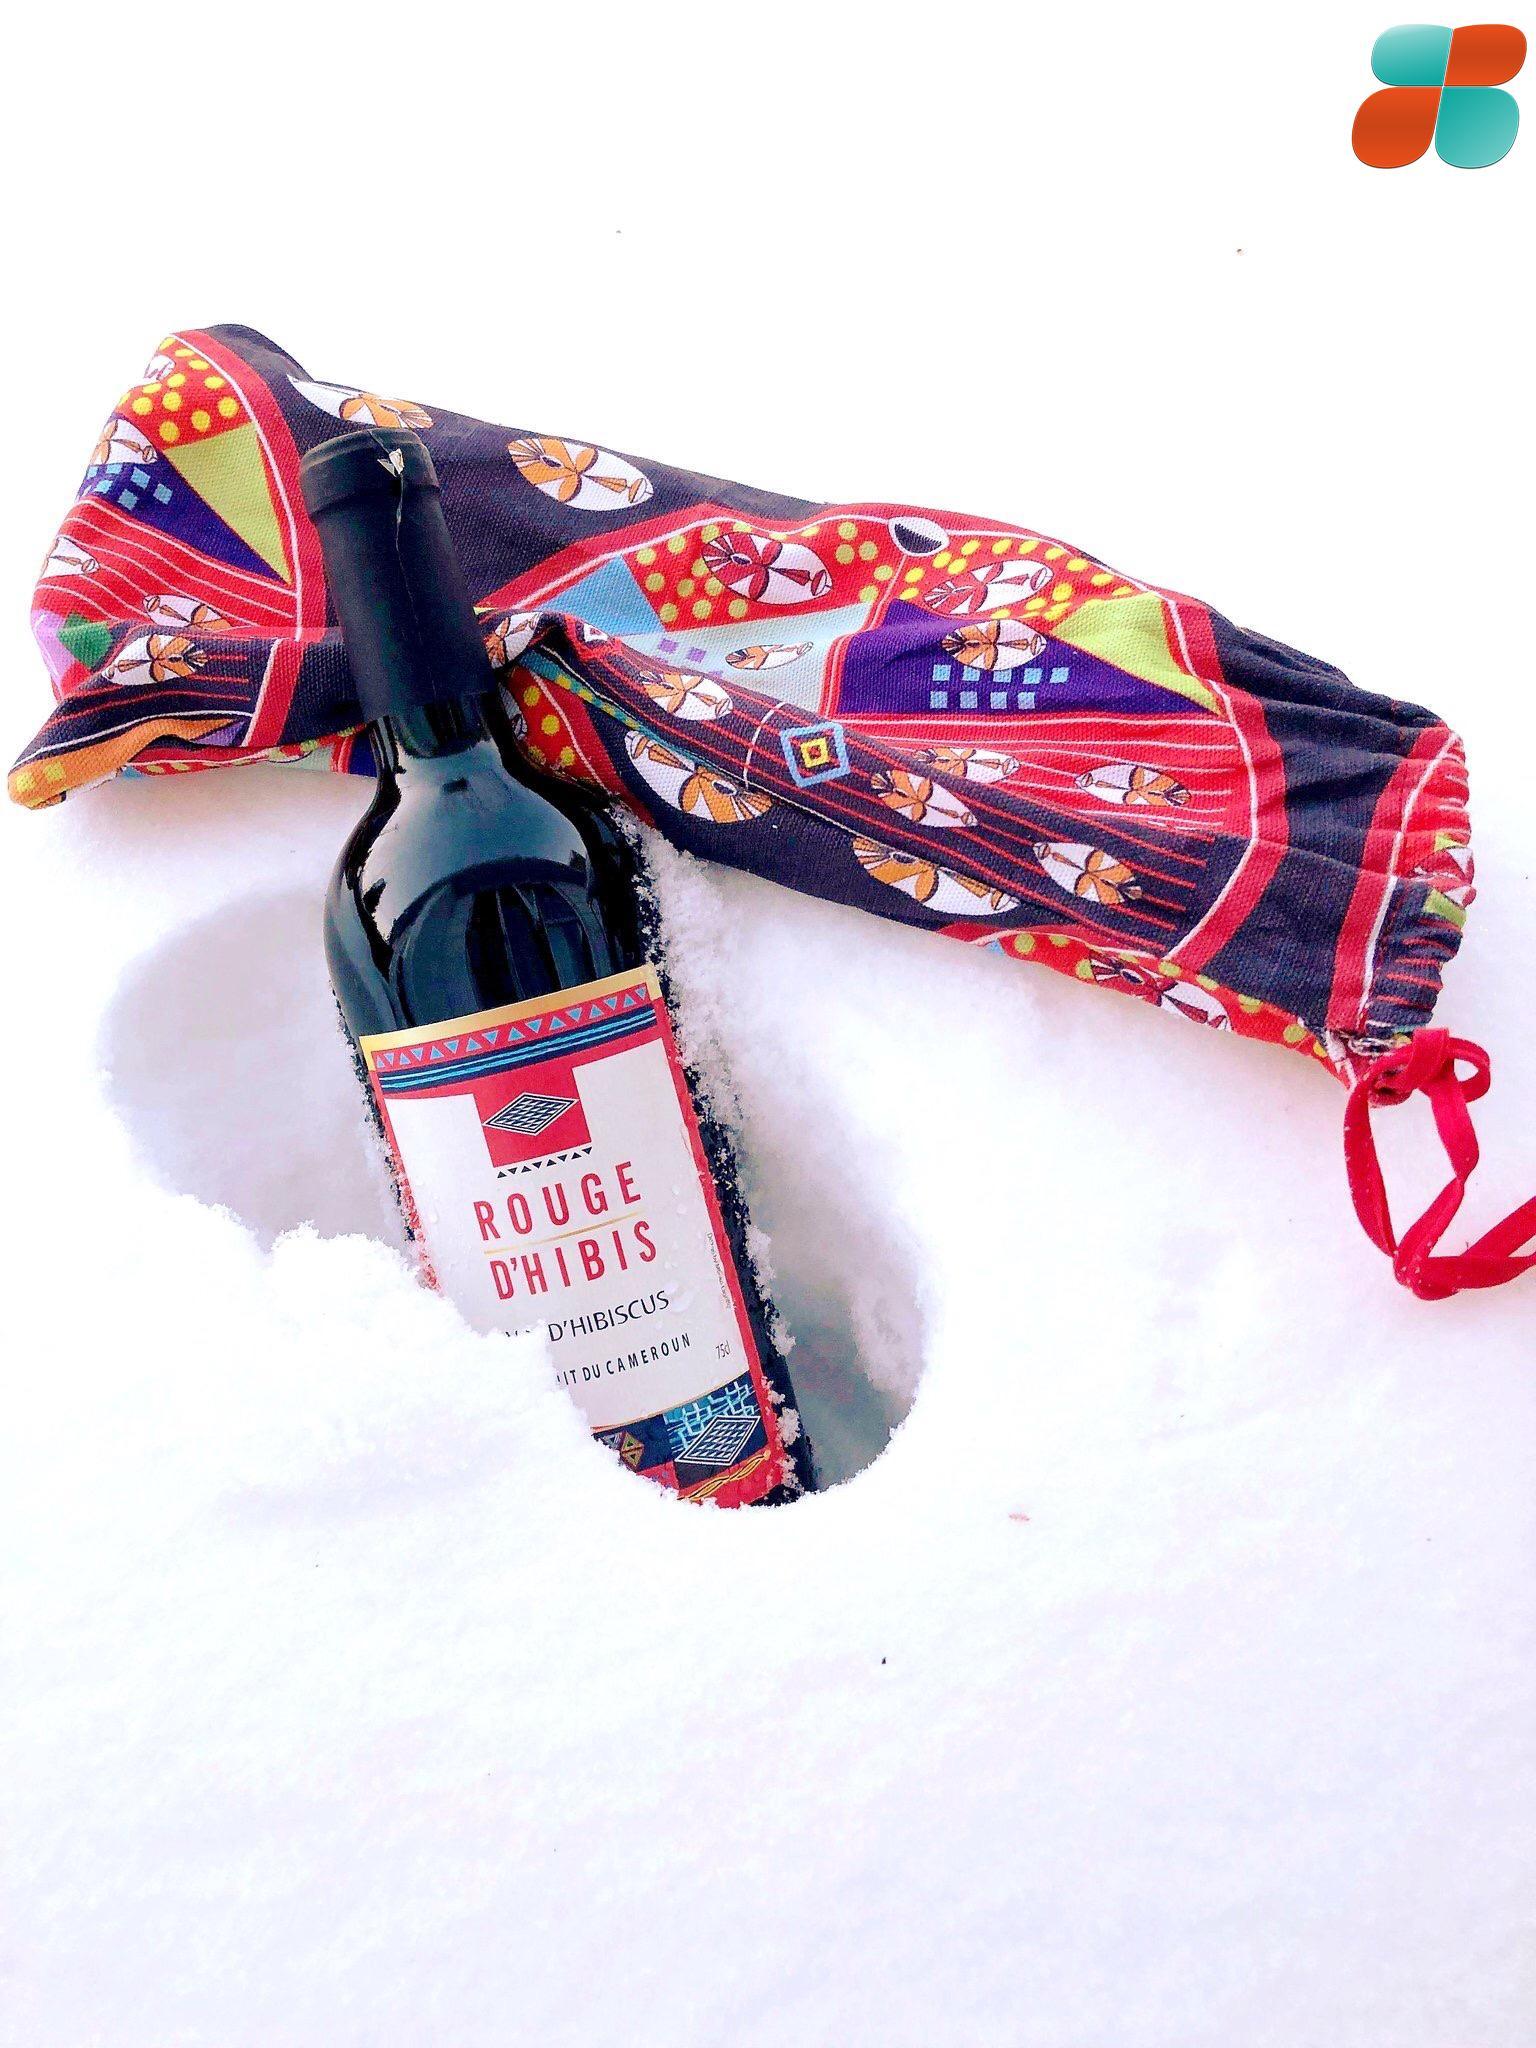 vin camerounais rouge d'hibis